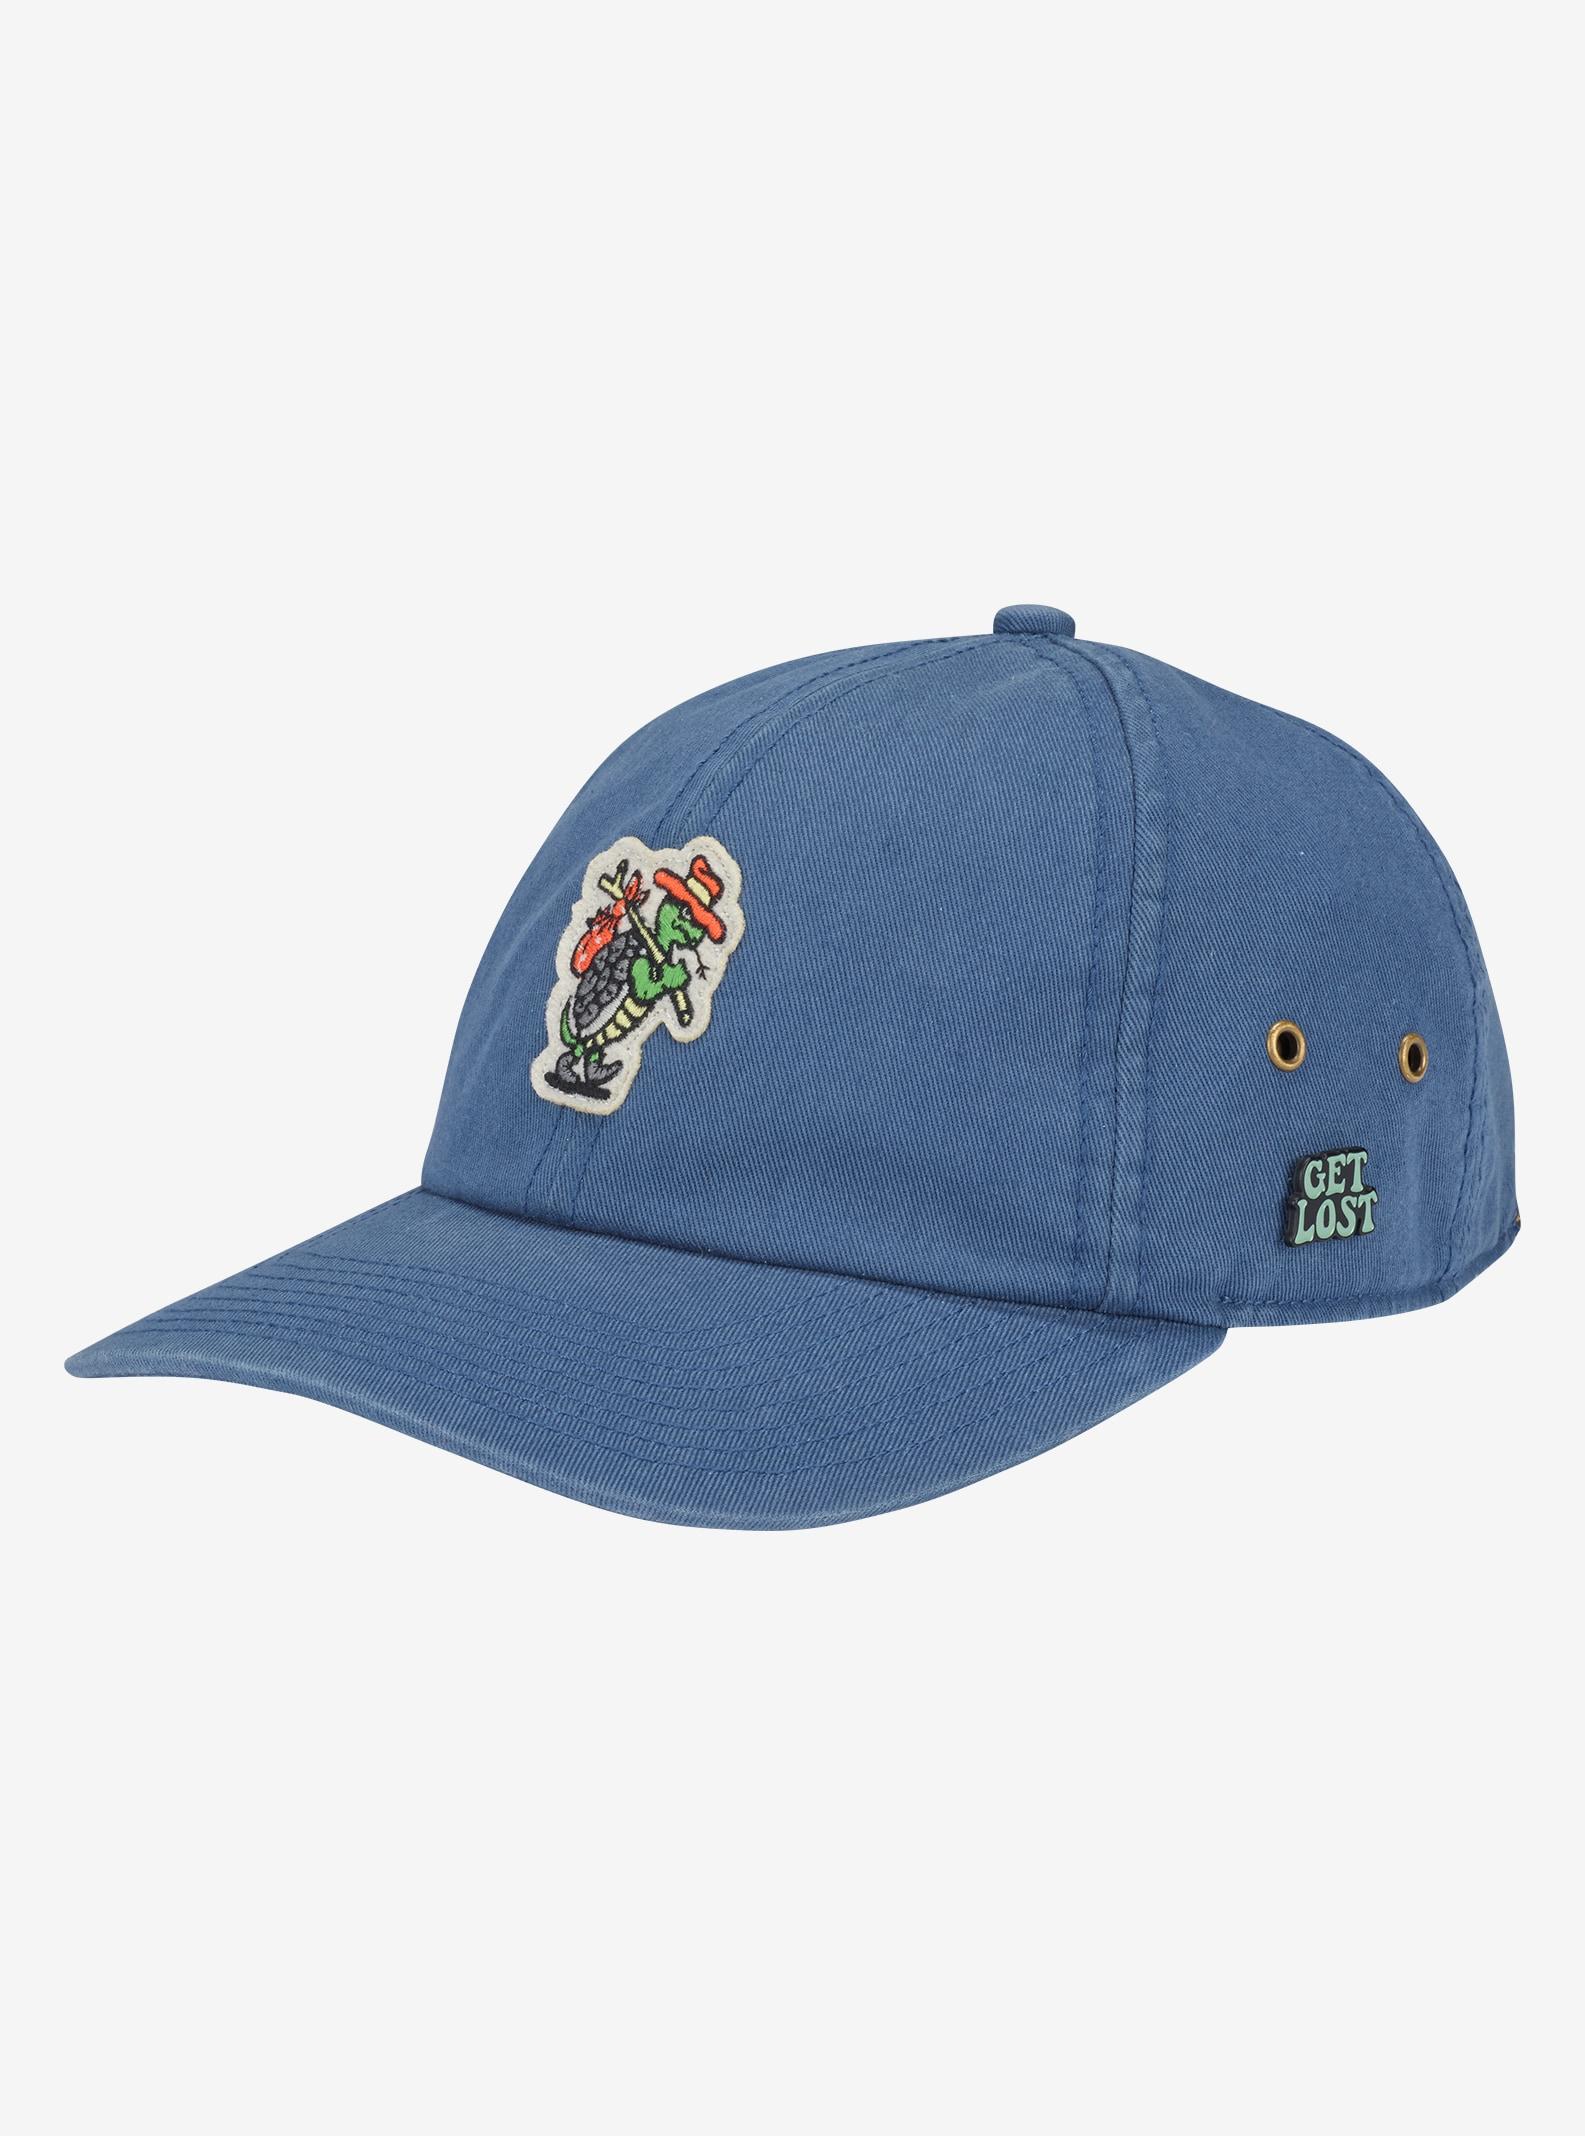 Burton Union Snapback Hat shown in Indigo